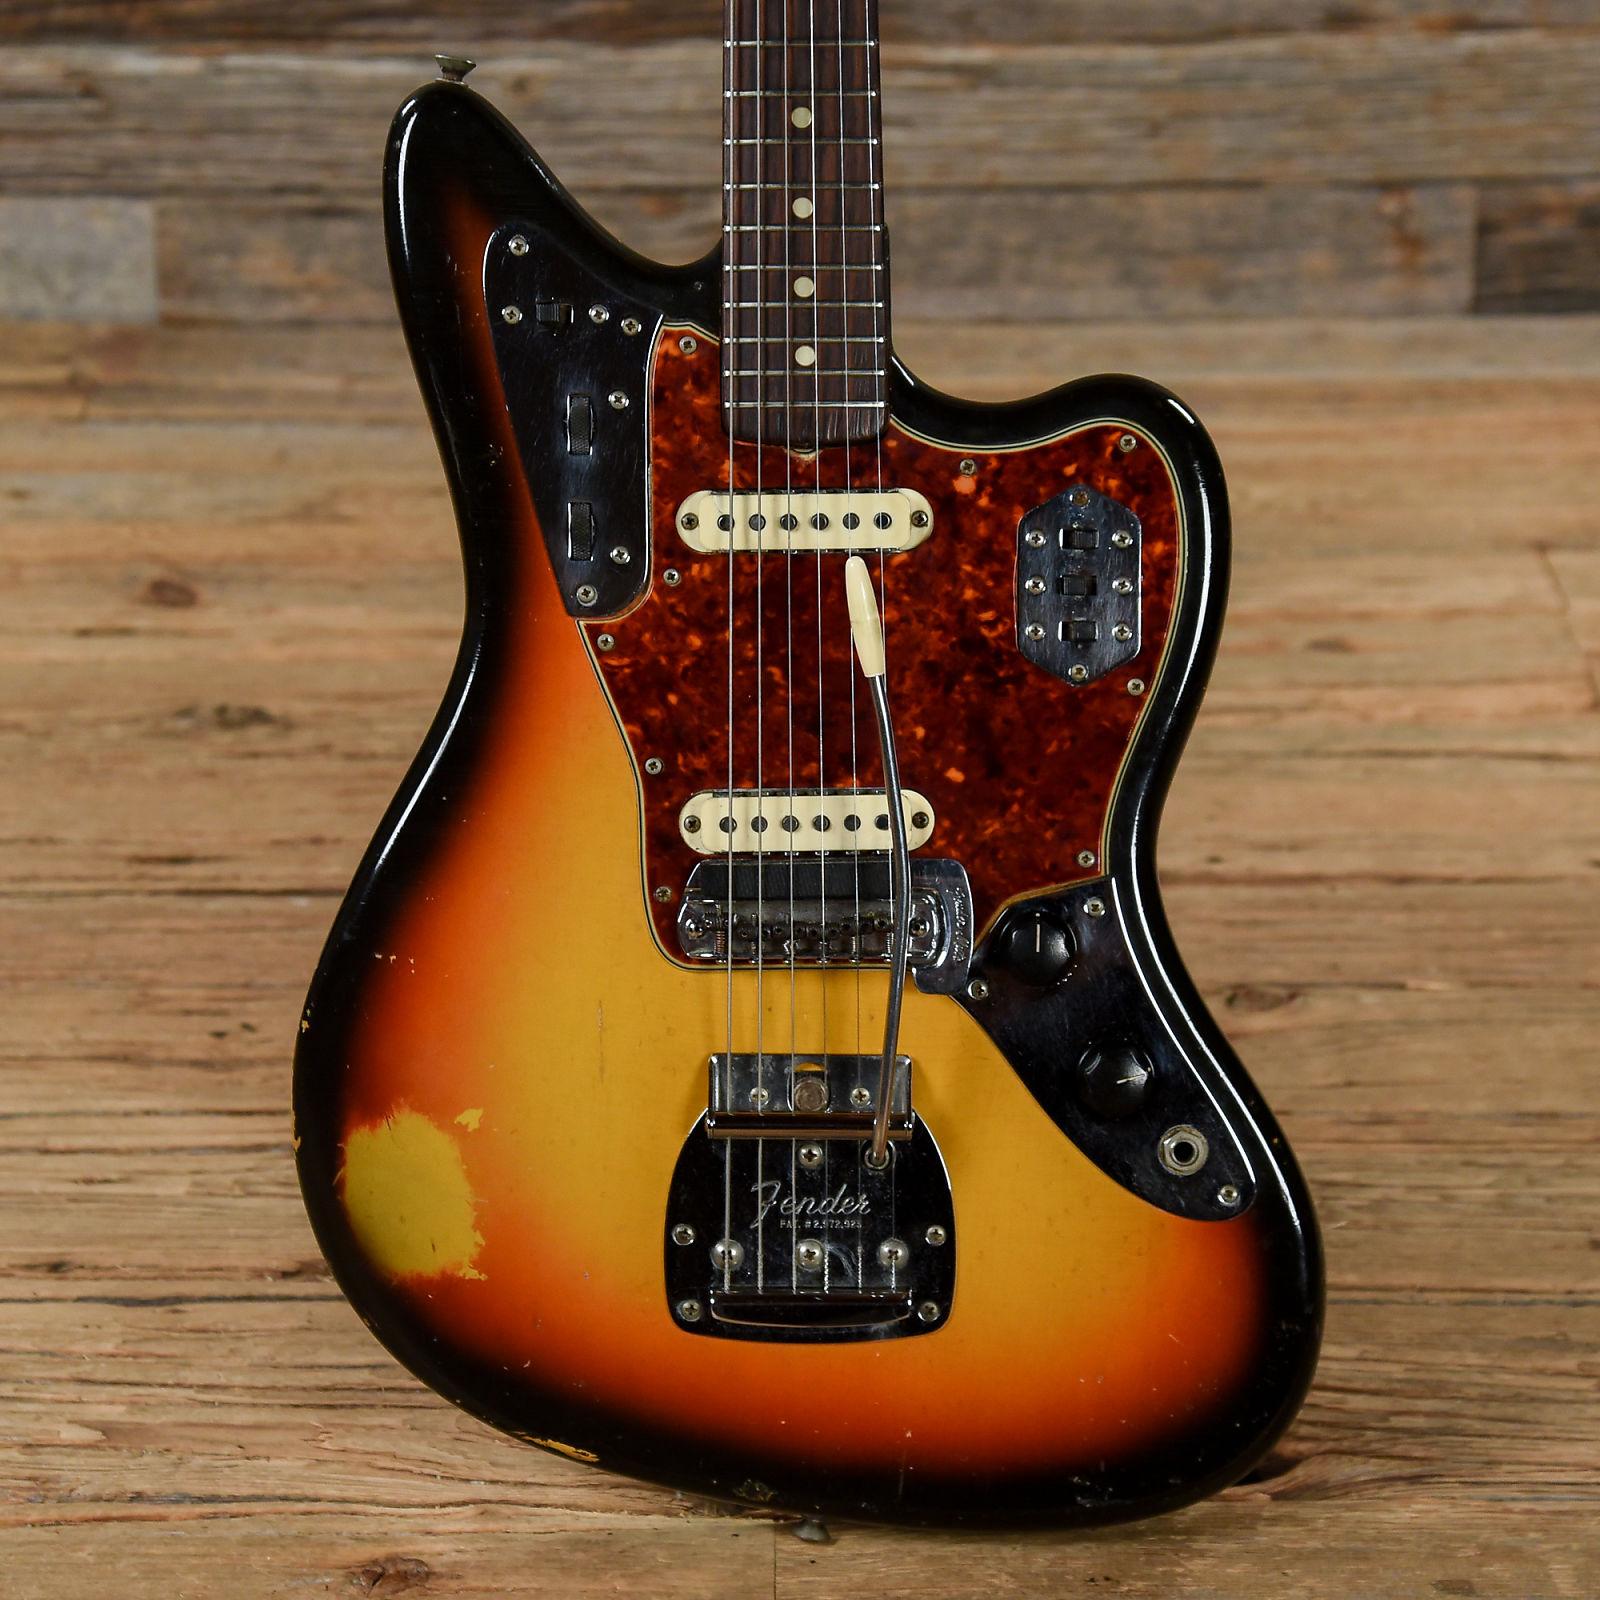 fender jaguar guitar xl tech for sale uncrate thumb cobain kurt